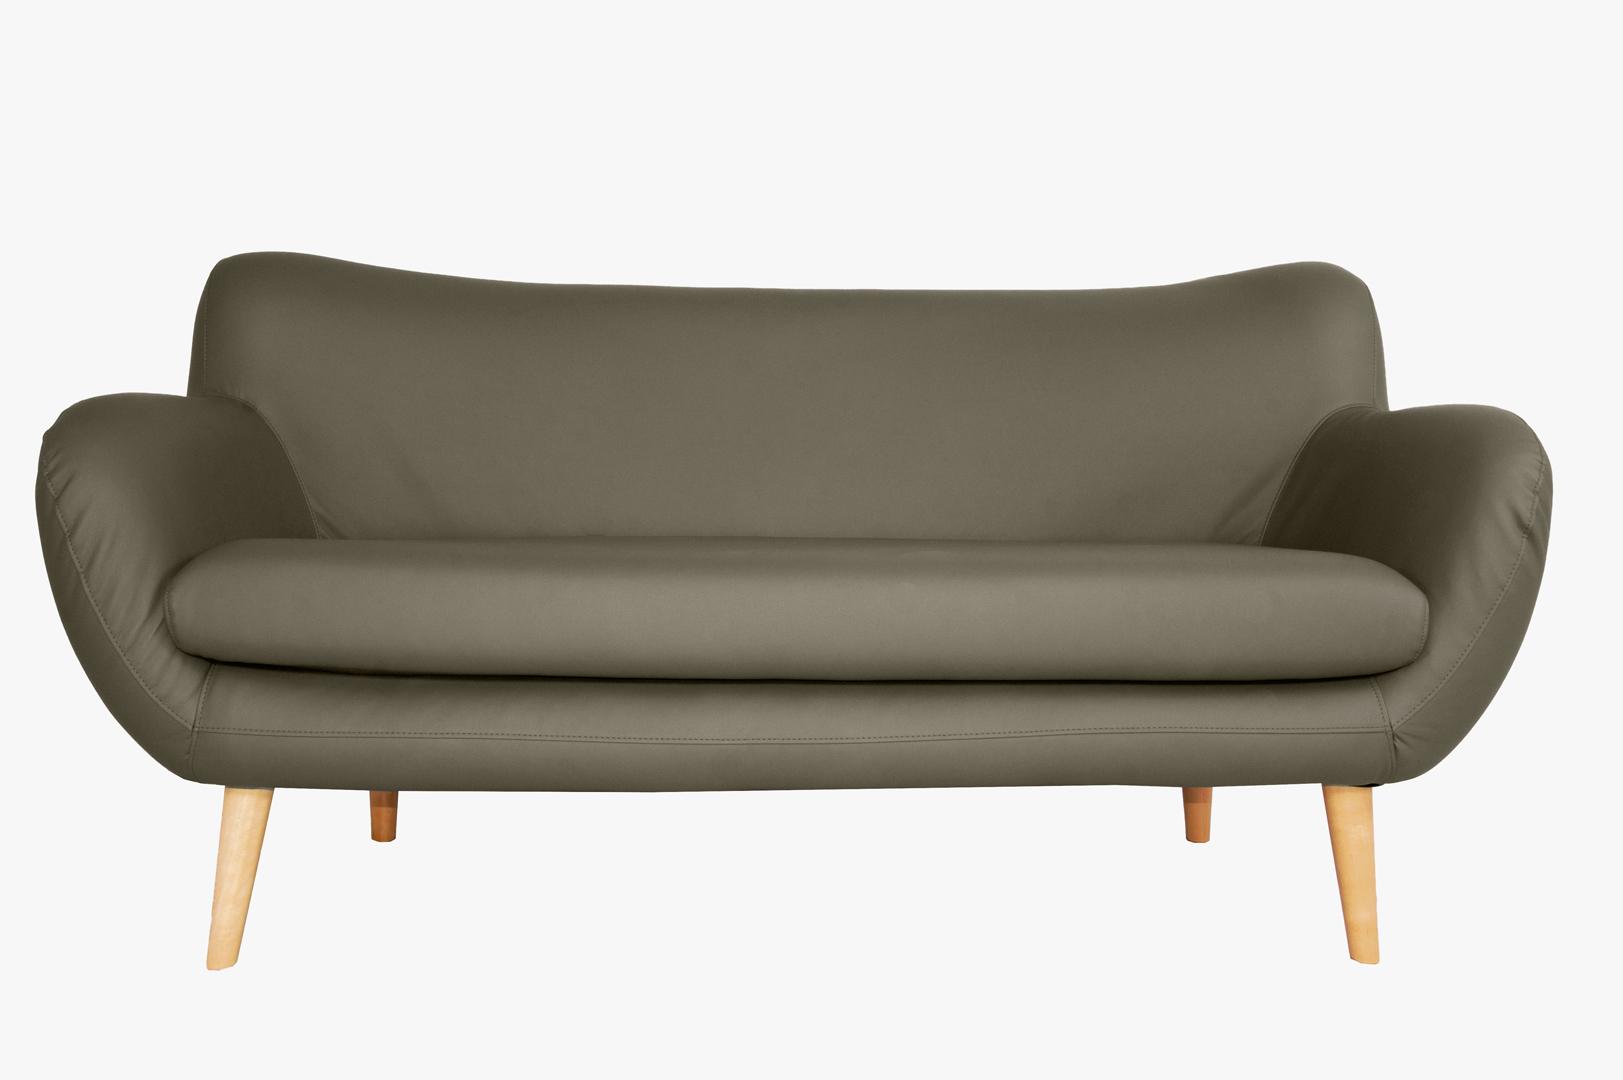 Canapé fixe design 3 places en PU taupe Axelle